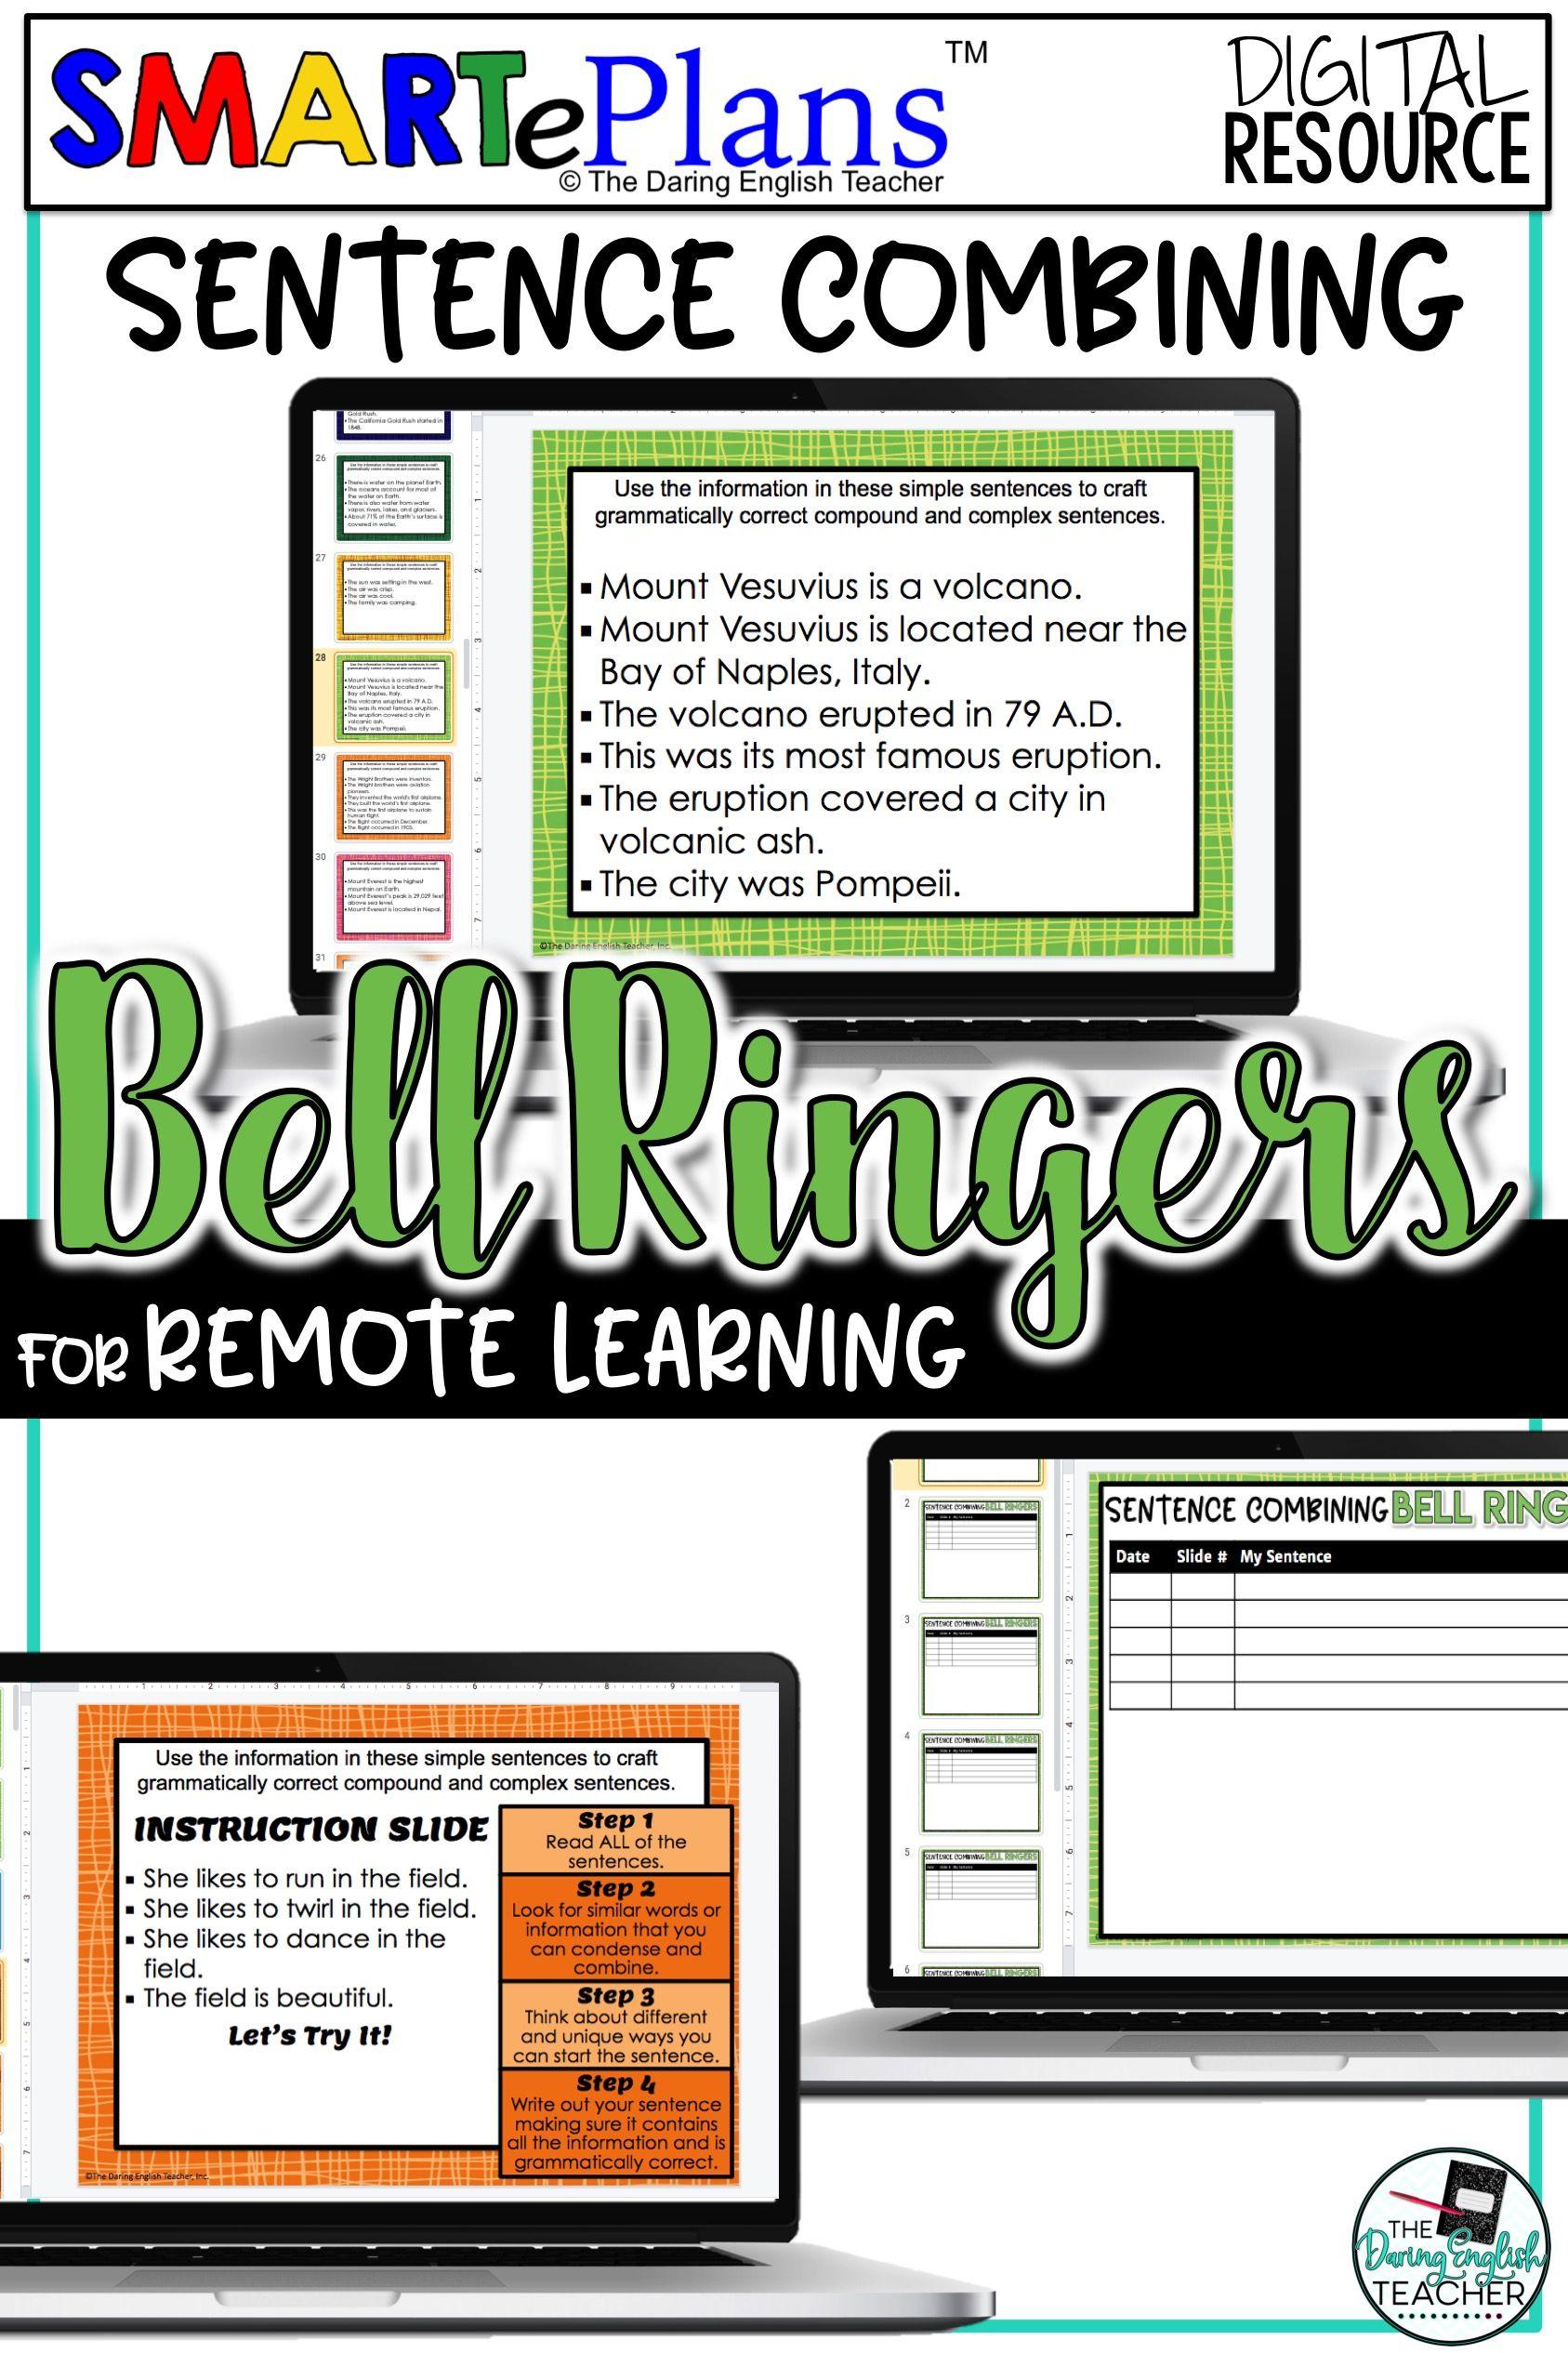 Digital Sentence Combining Writing Bell Ringer Activity In